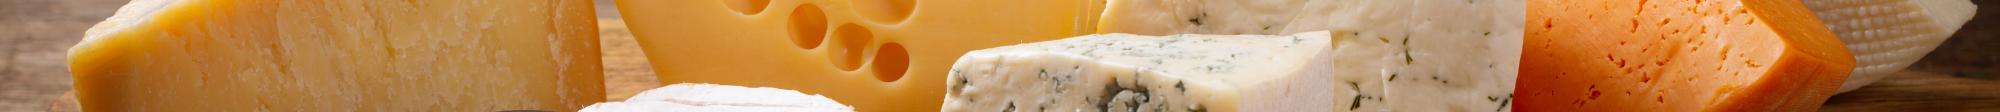 Comprar  quesos Dinamarca gourmet online | Mixtura Gourmet